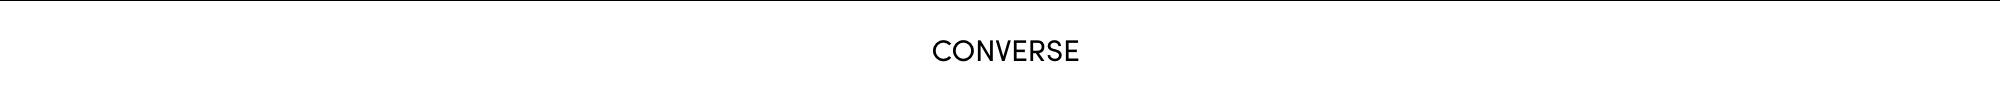 Converse Banner